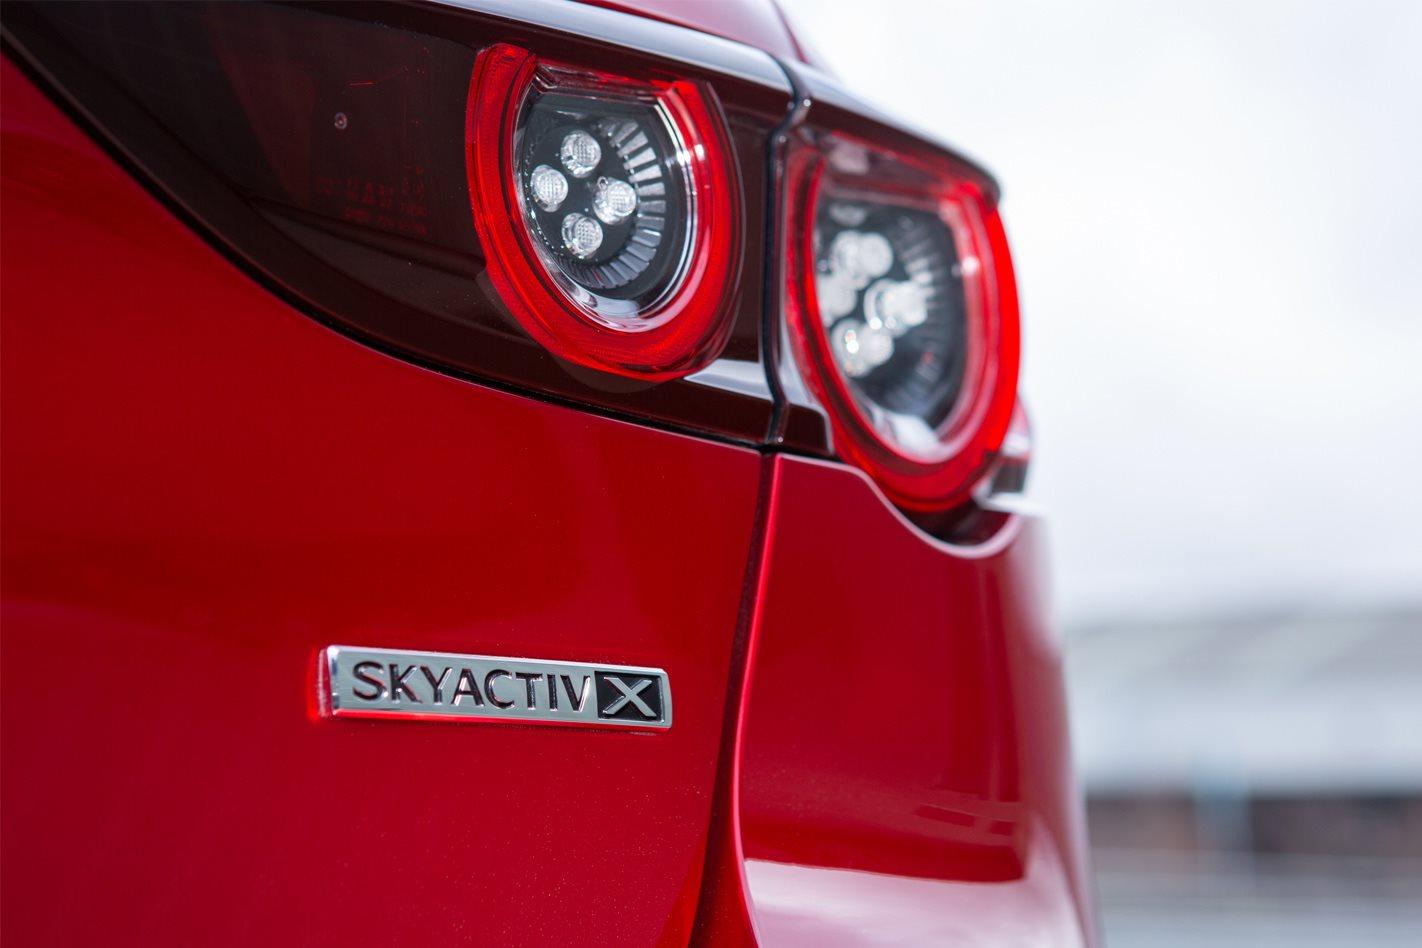 2020 Mazda 3 Skyactiv X M Hybrid review